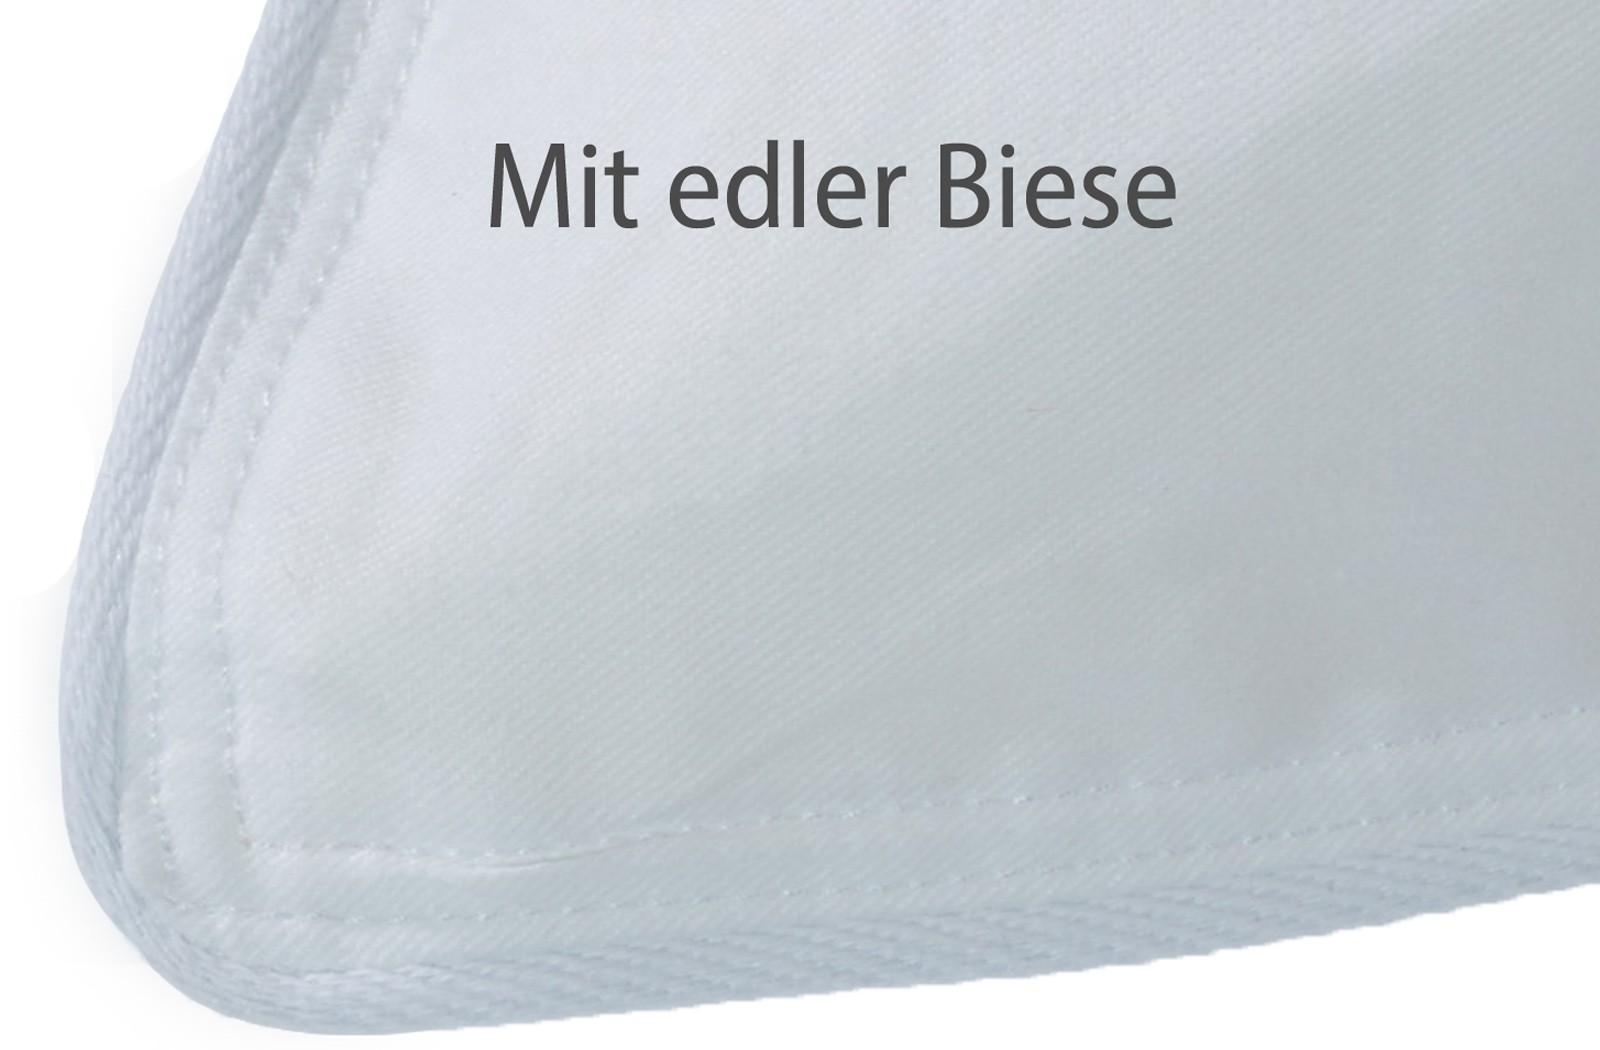 2x Kopfkissen 15% Gänse-Daunen Kissen Federn Klasse 1  80x80 Svenja – Bild 3